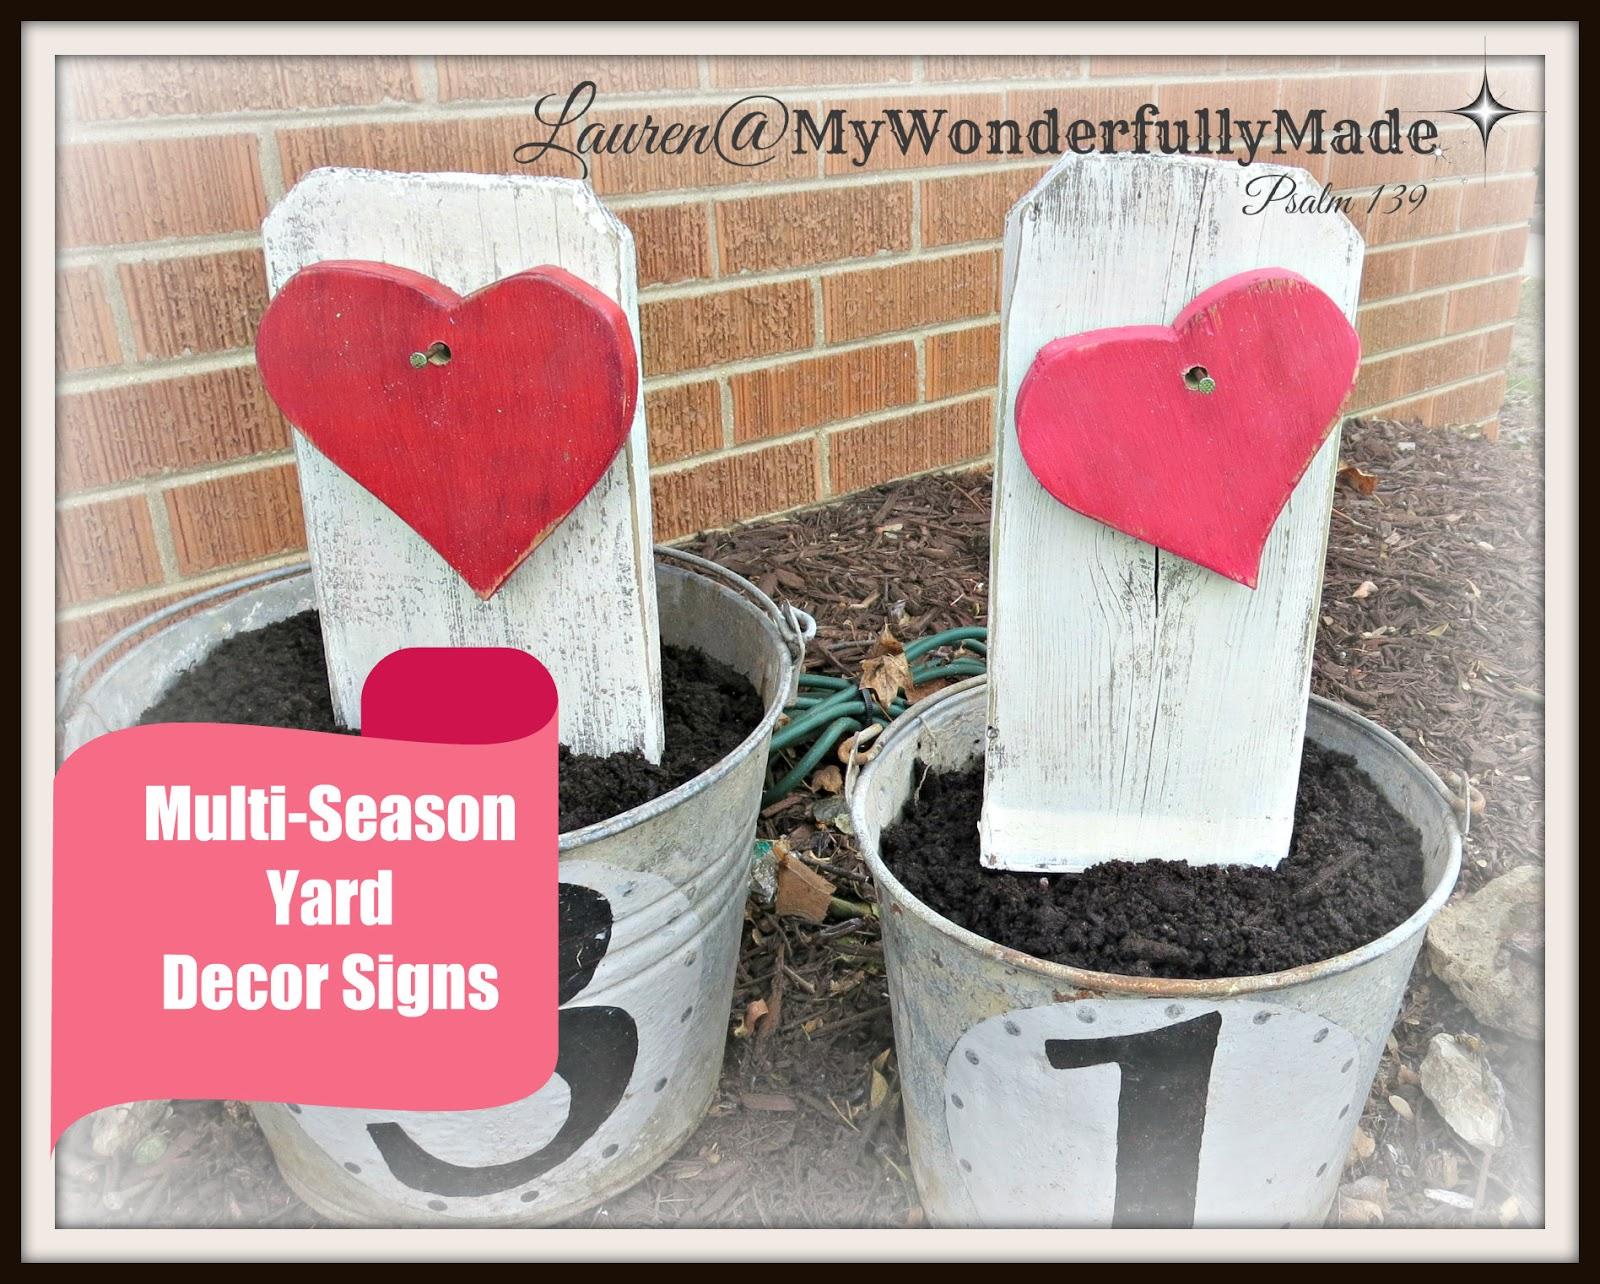 Wonderfully Made Multi Season Yard Decor Signs